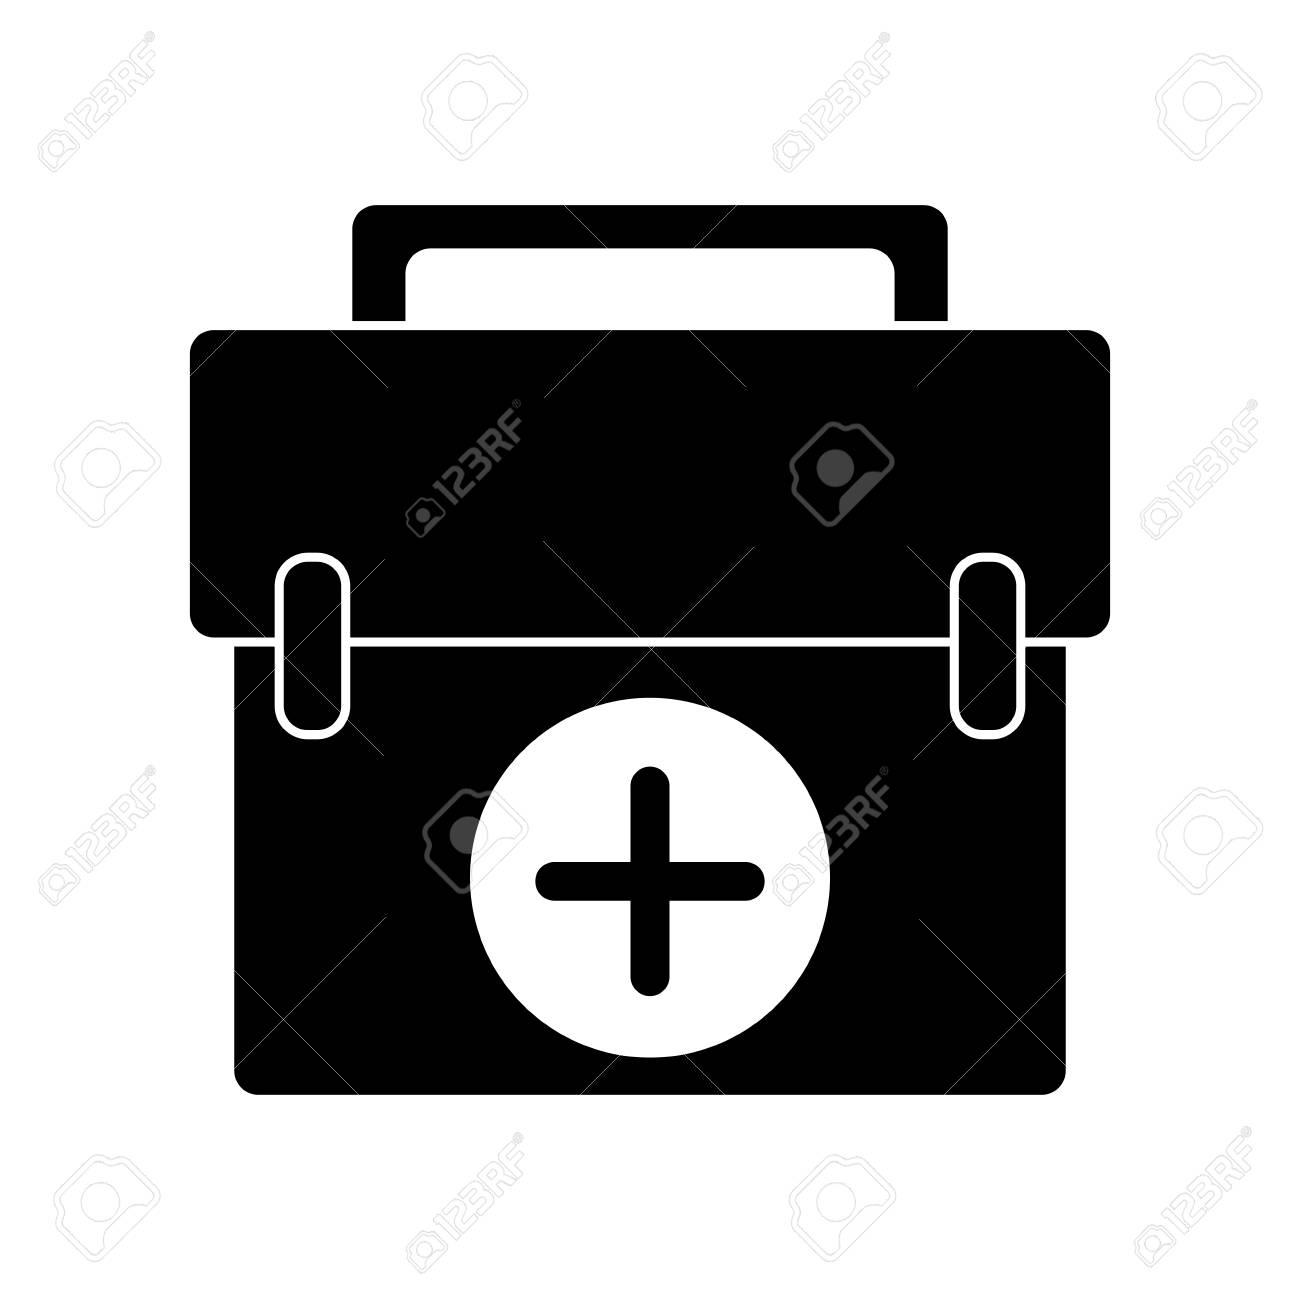 first aid kit emergency equipment pictogram vector illustration rh 123rf com vectorfirstaid serial vectorfirstaid serial